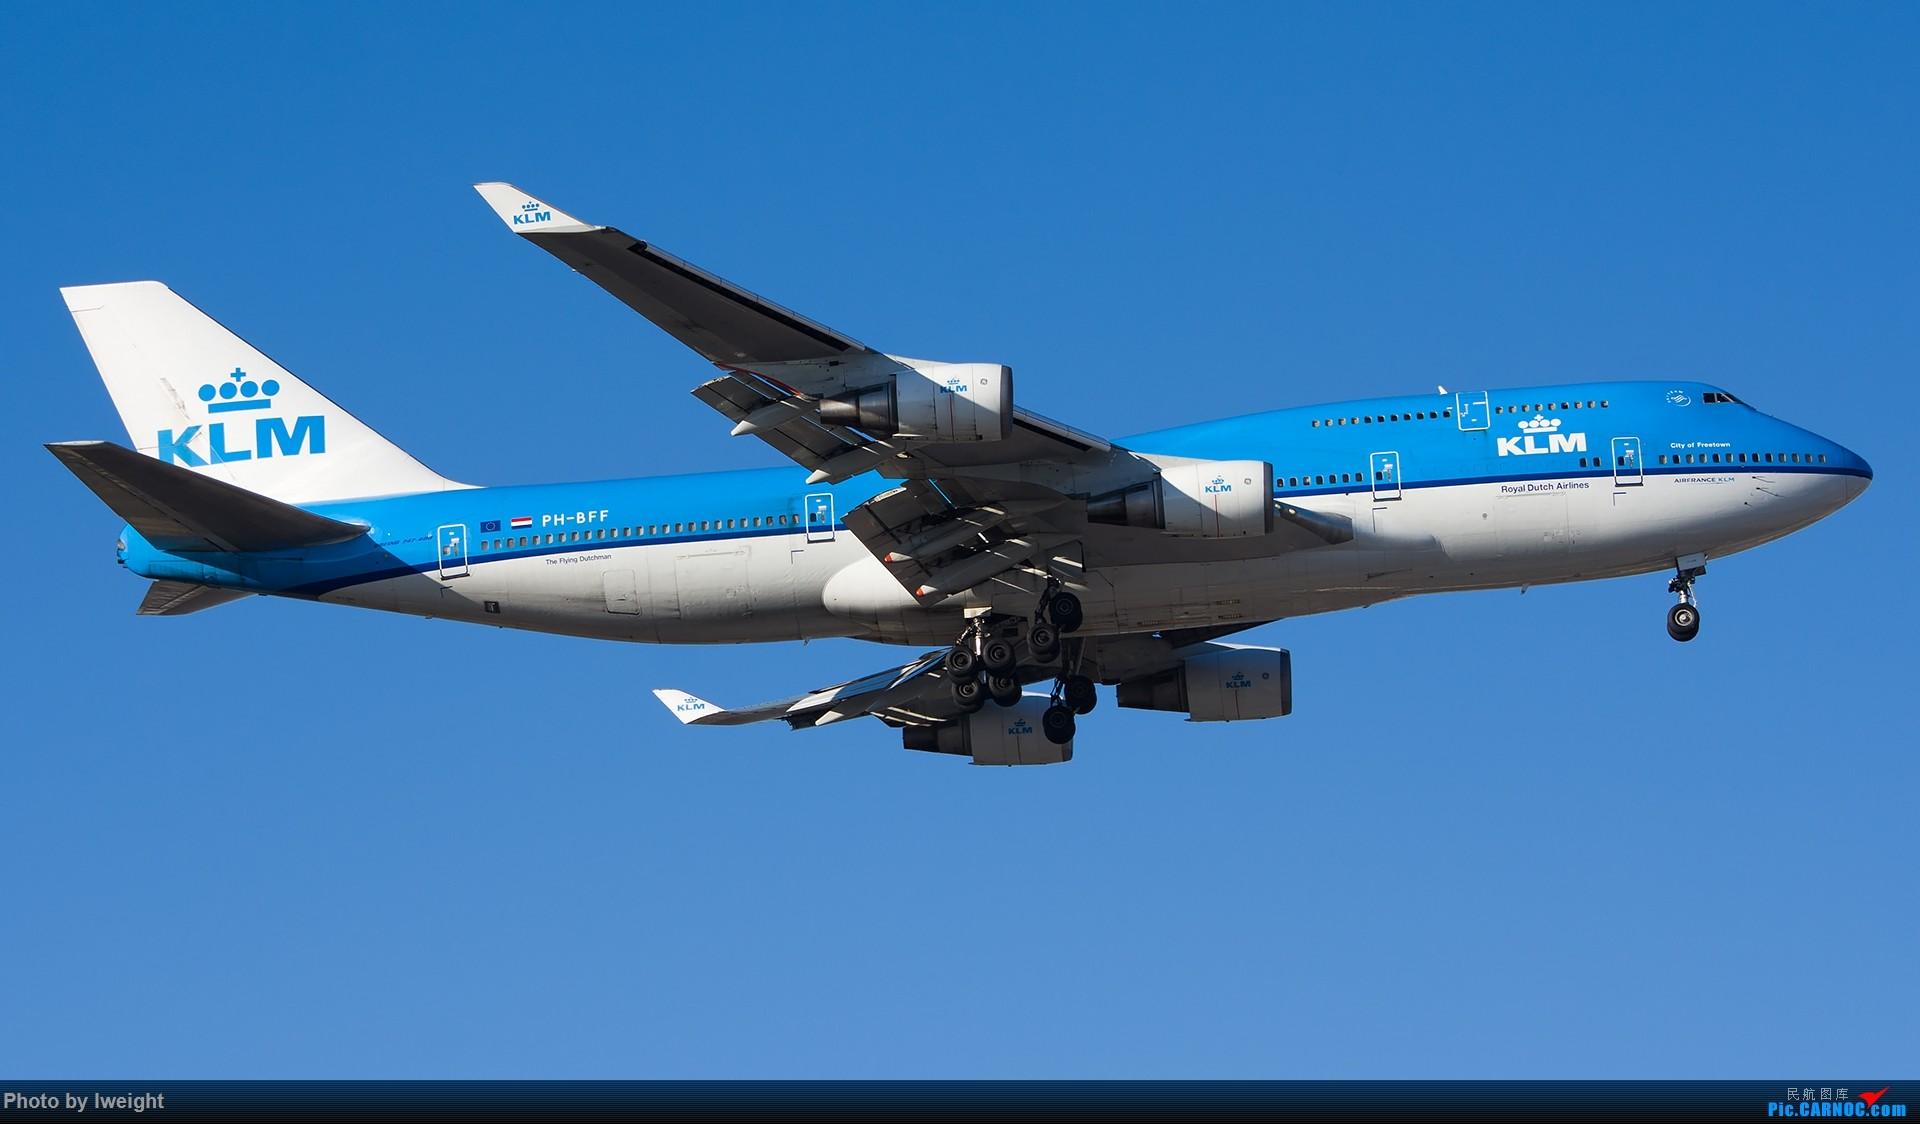 Re:[原创]又见蓝月亮 BOEING 747-400 PH-BFF 中国北京首都国际机场